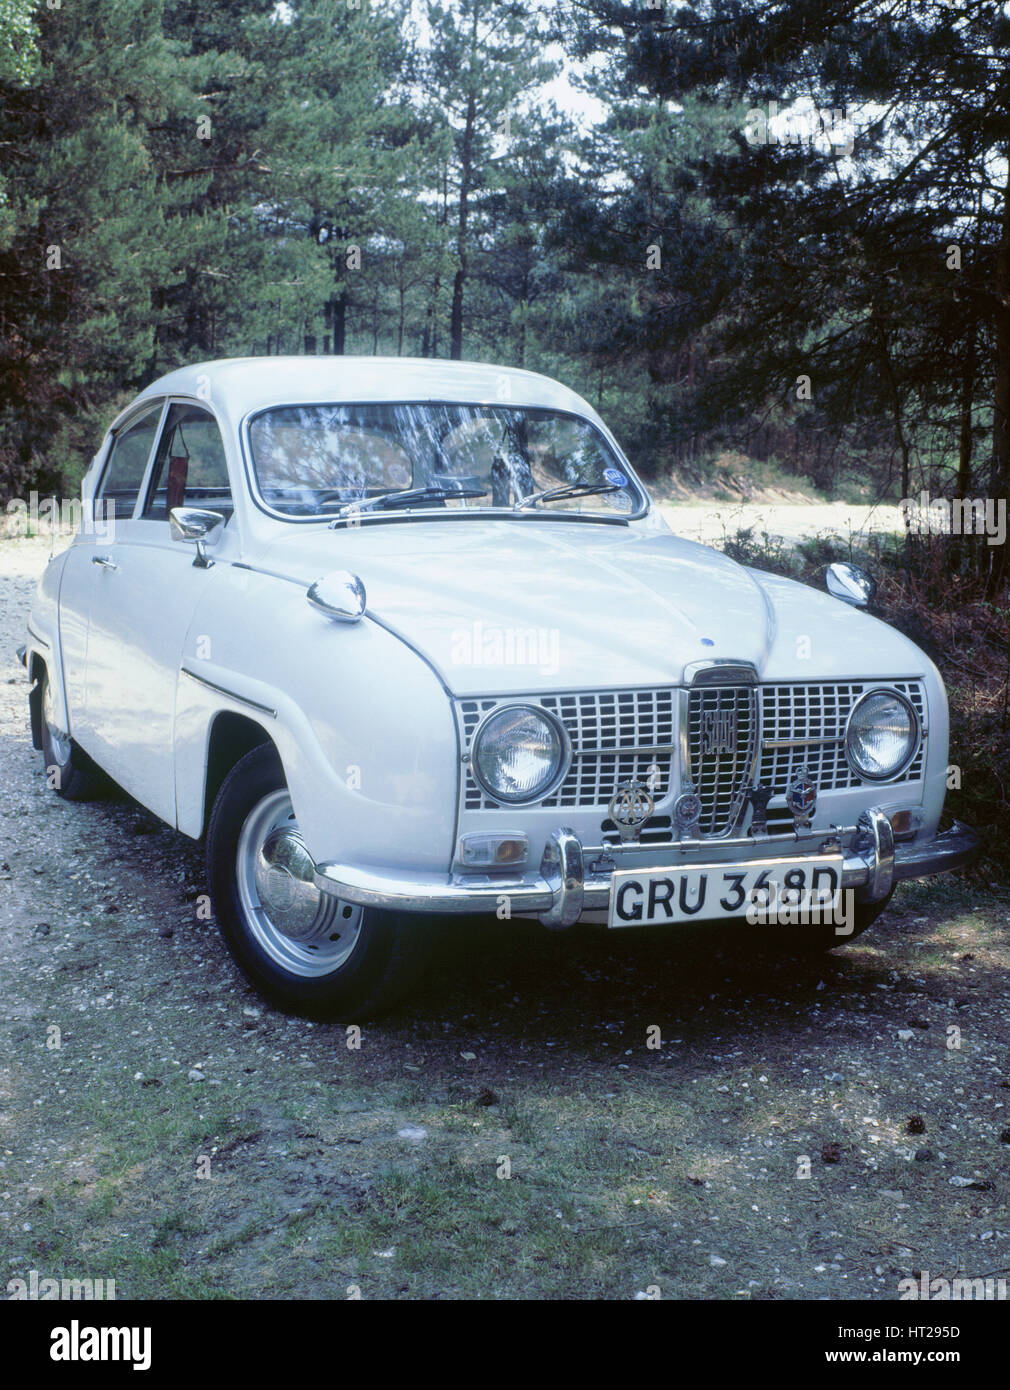 1966 Saab 96. Artist: Unknown. - Stock Image